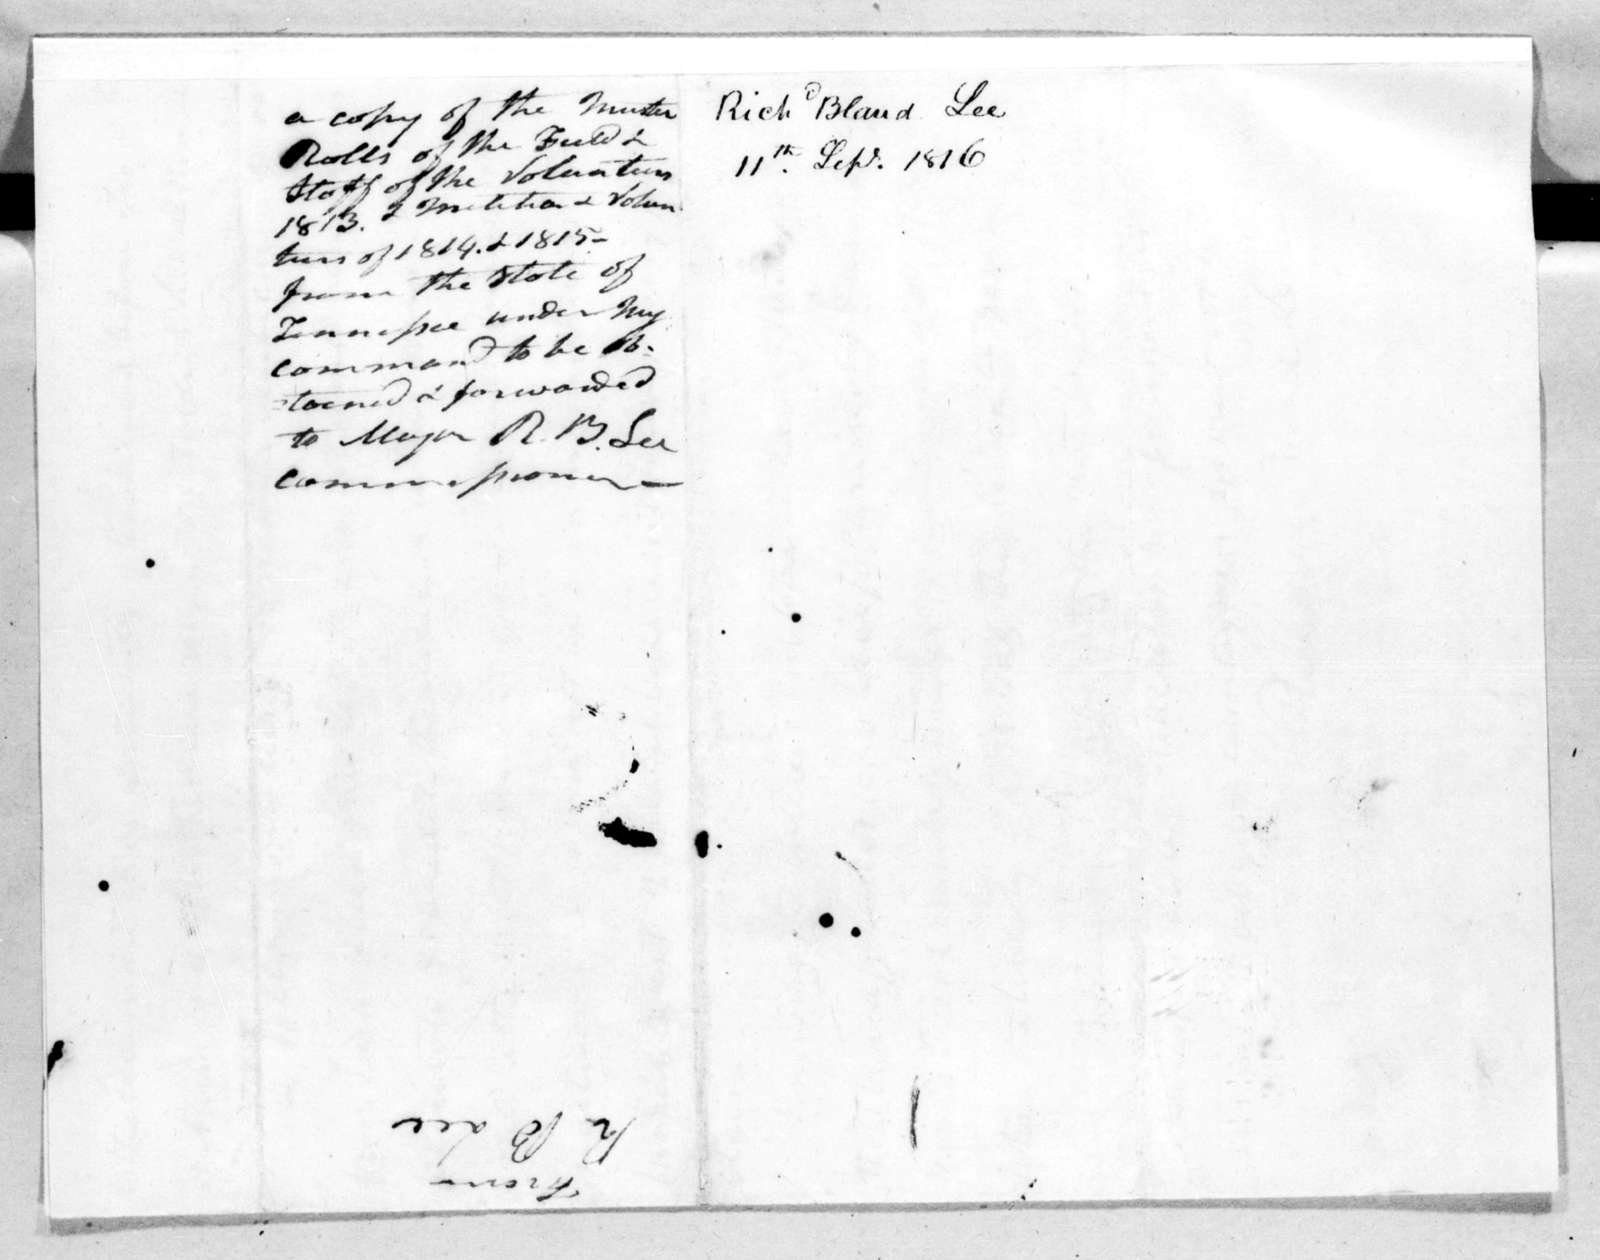 Richard Bland Lee to Andrew Jackson, September 11, 1816